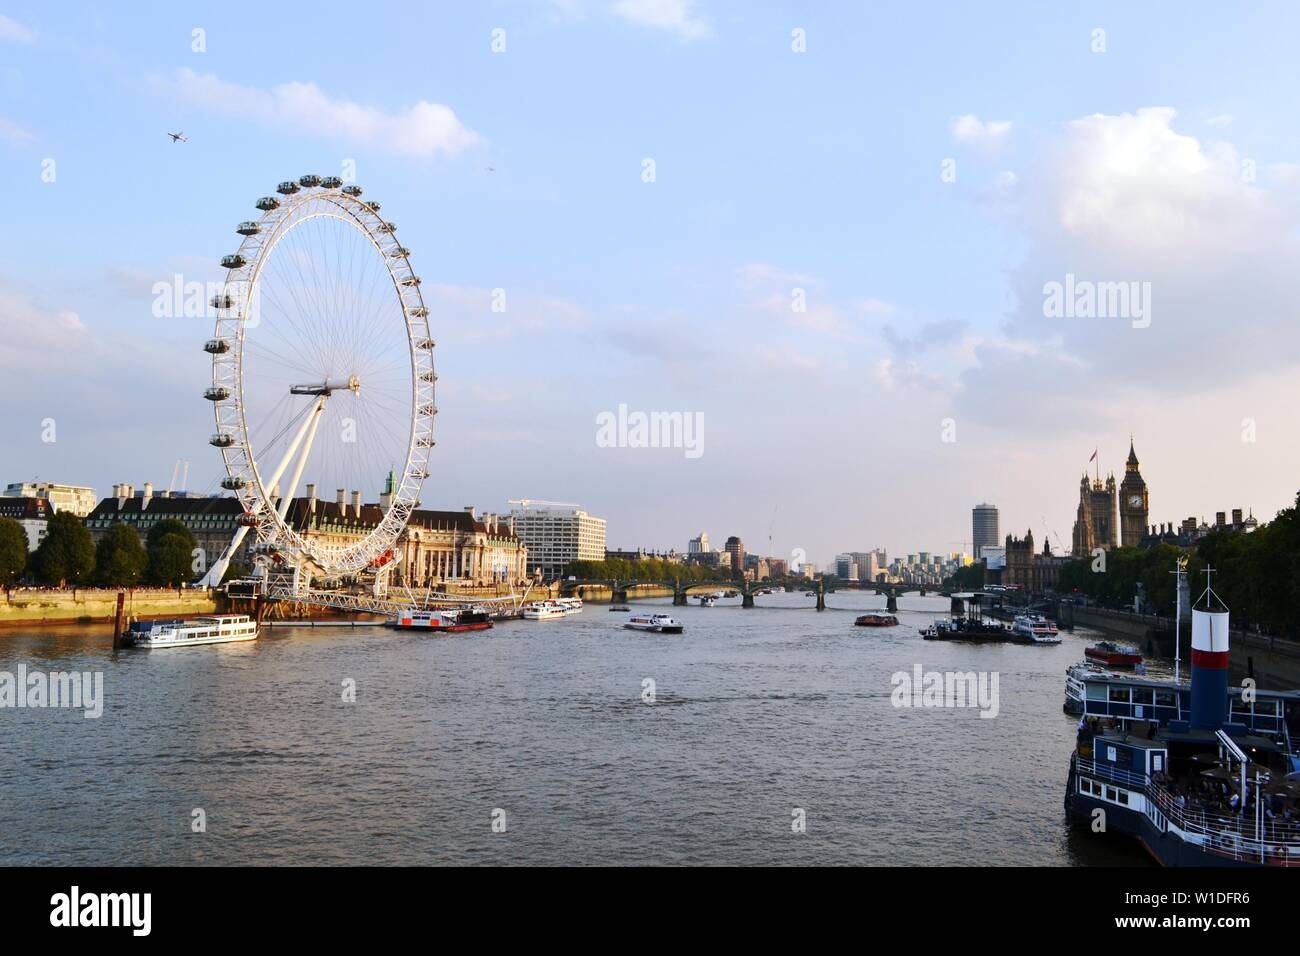 London/UK - September 7, 2014: Panoramic View to London Eye, Thames river, Houses of Parliament, Westminster bridge, Big Ben at sunset. Stock Photo